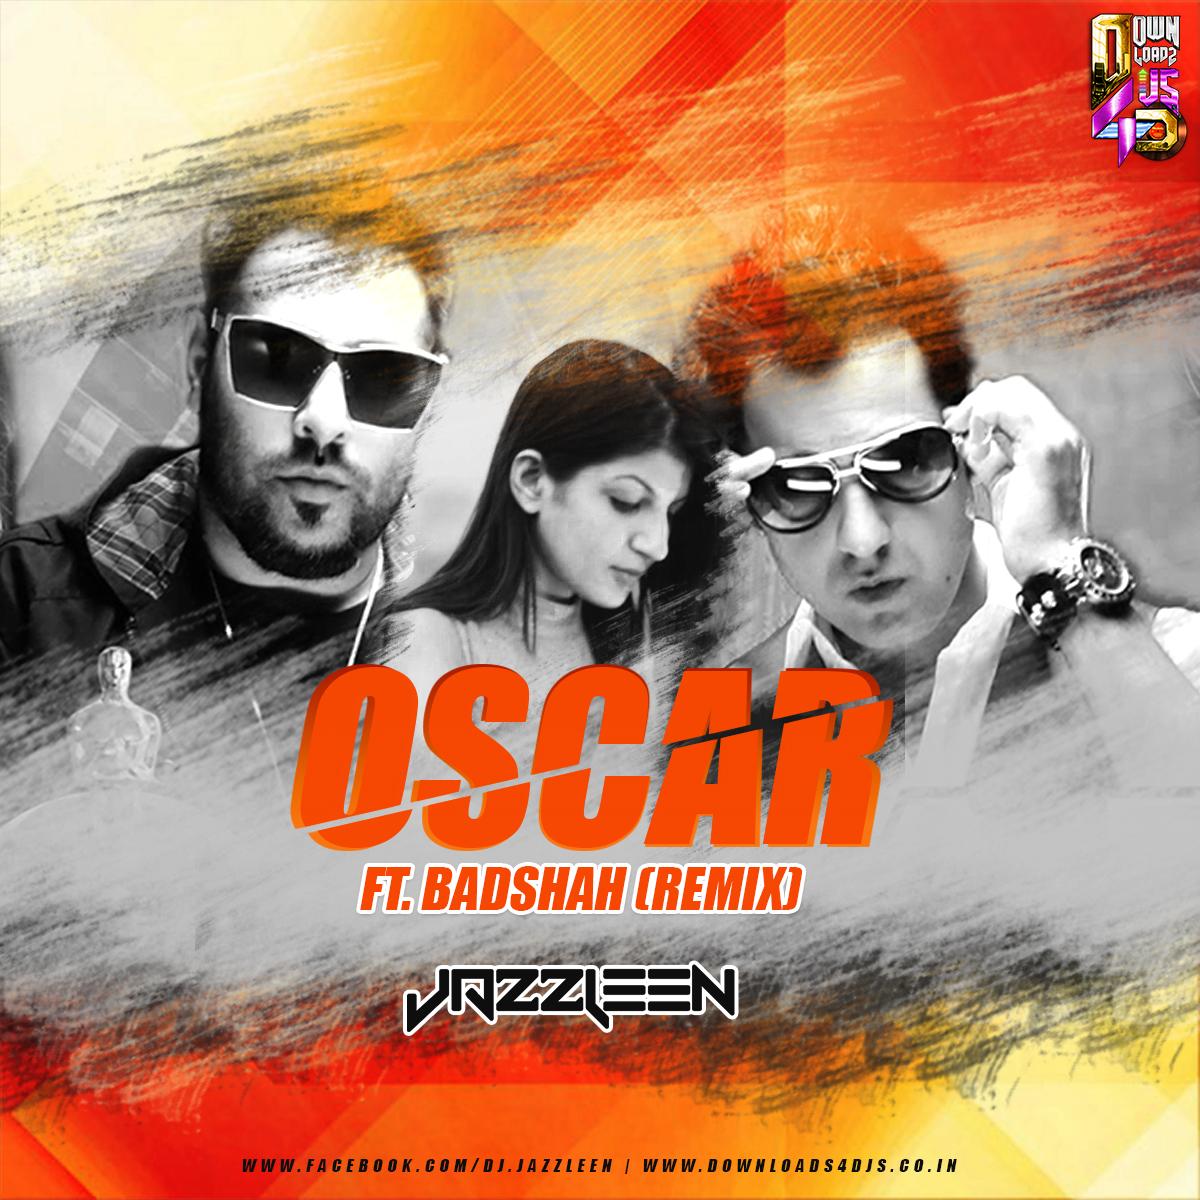 Daru Badnam Dj Remix Sapna: Oscar Ft. Gippy Grewal & Badshah (Remix